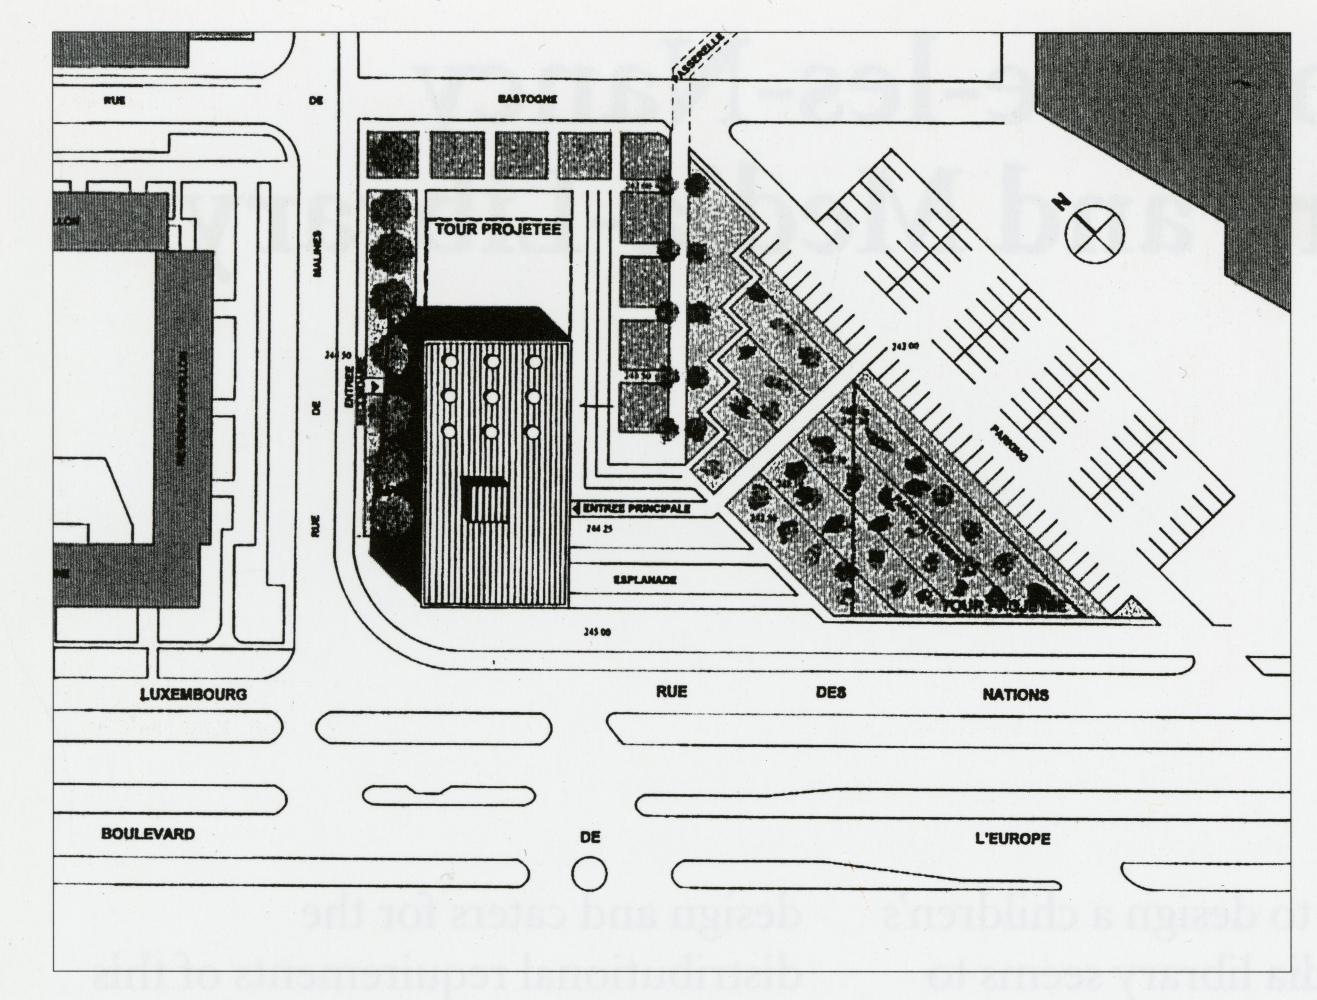 20-vandoeuvre-img-002 Pascale SEURIN Architecte - Pascale SEURIN Architecte